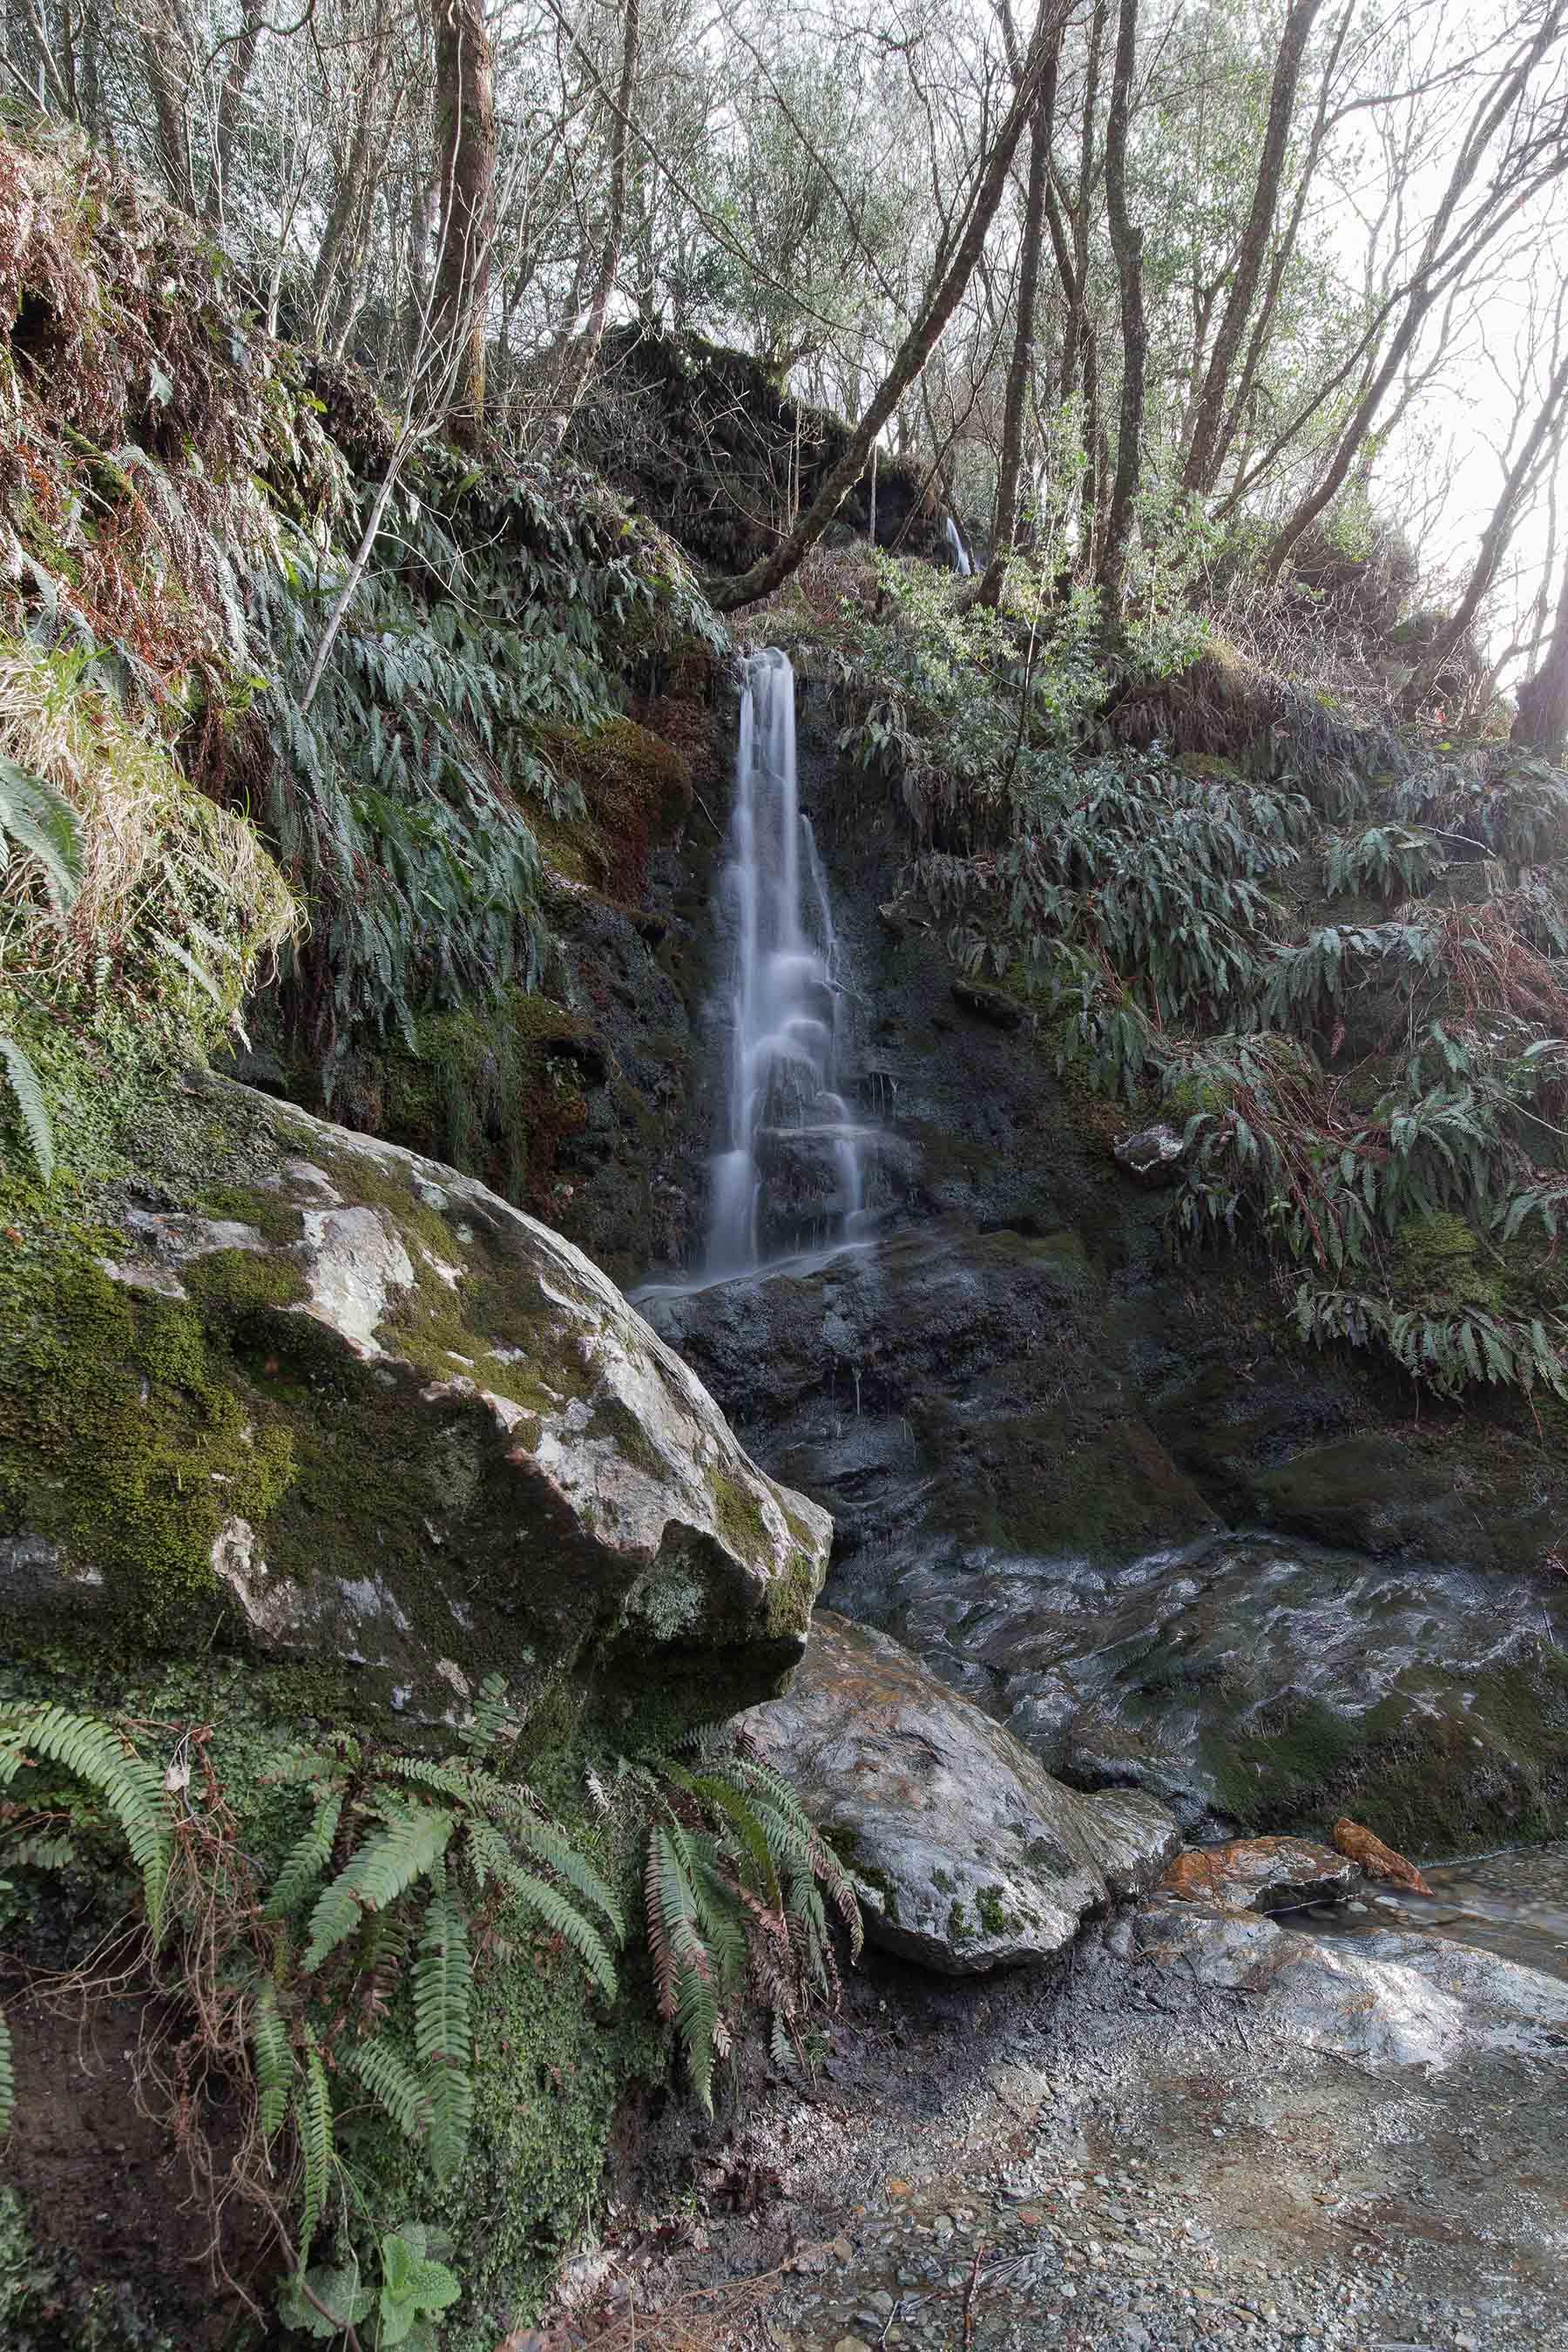 waterfall-mountains-glendalough-dublin-ireland-europe-famous-place-city-pub-themovinglens-colourfull-travel-photography-destination-life